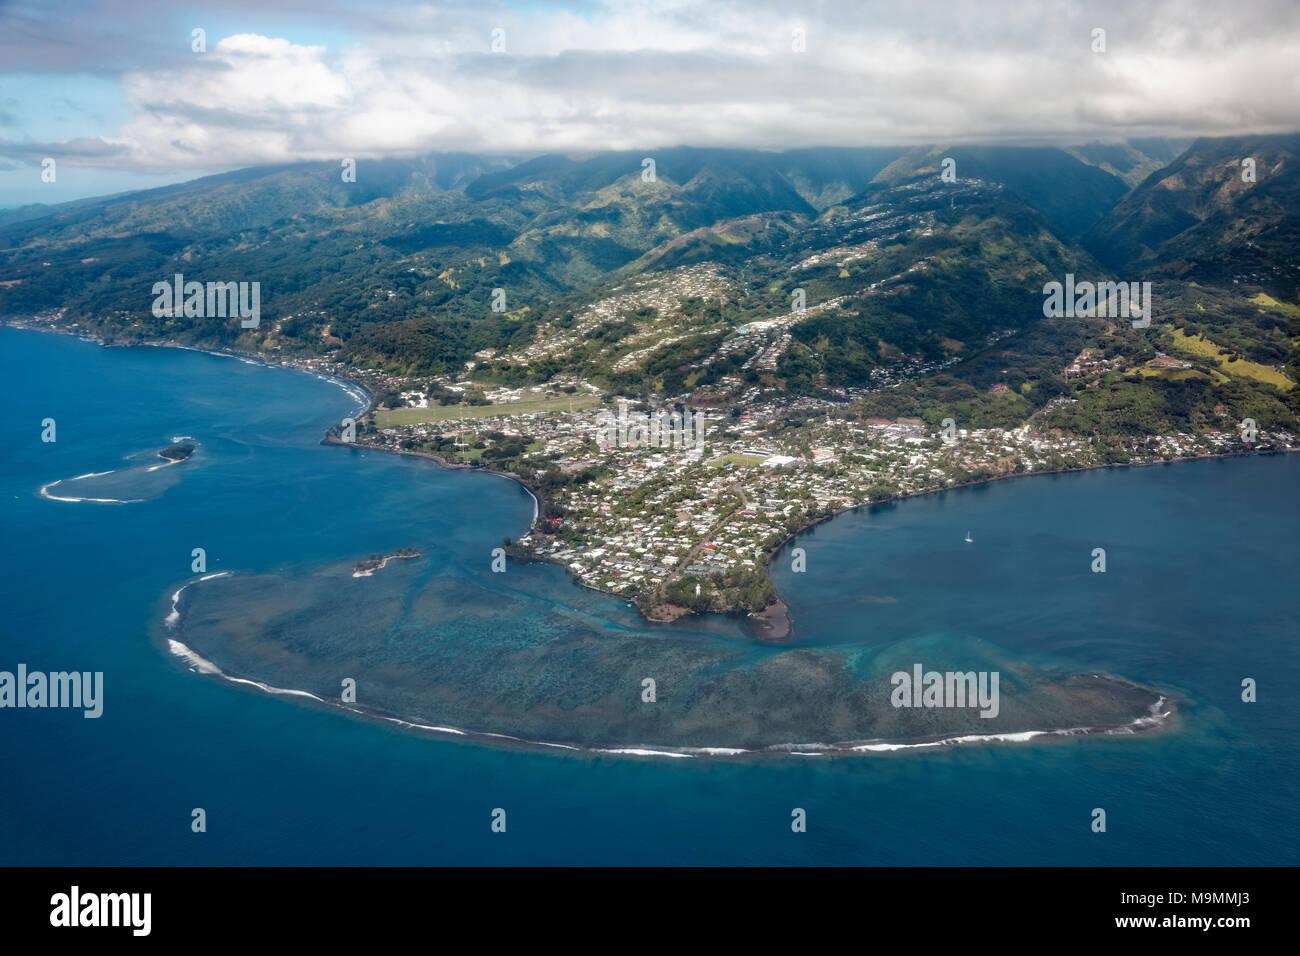 Plage de la Pointe Venus with Coral Reef, Pacific Ocean, Mahina, Tahiti Nui, Society Islands, Windward Islands, French Polynesia - Stock Image